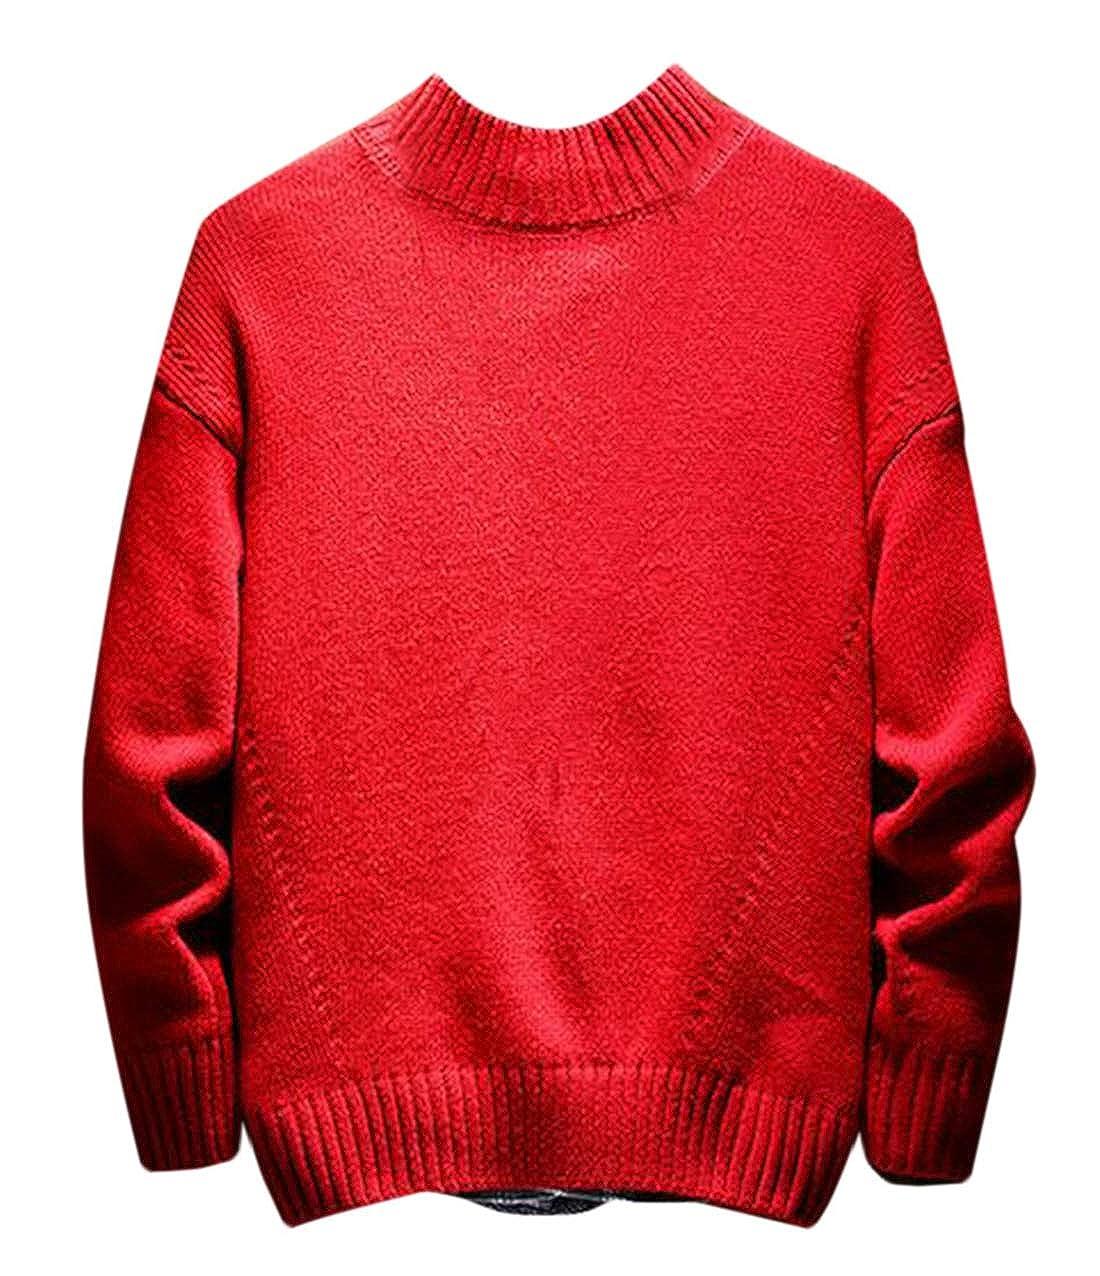 Hmarkt Men Turtleneck Pullover Knitted Warm Casual Winter Long Sleeve Sweater